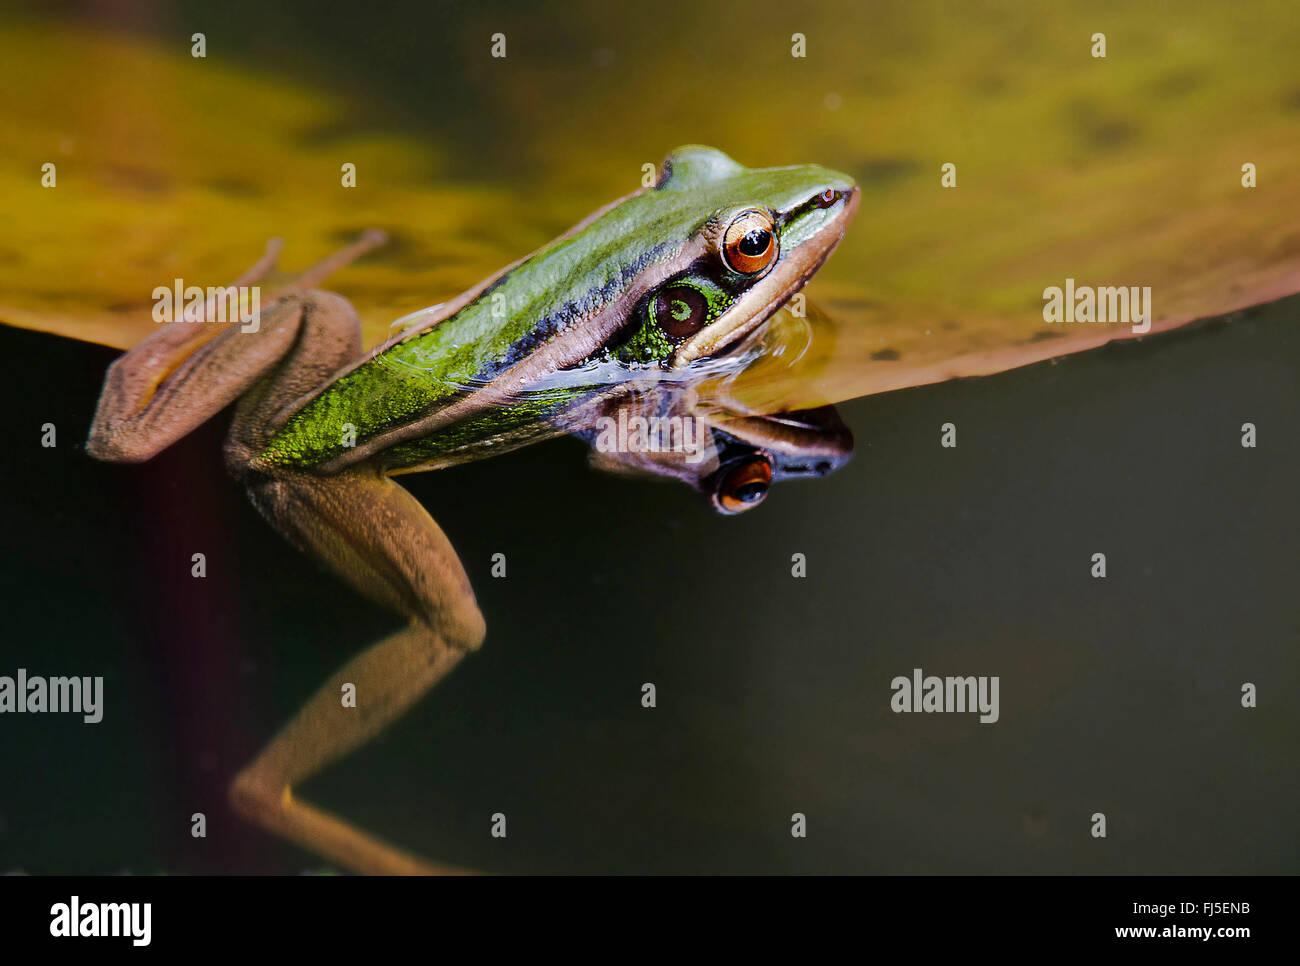 frog (Hylarana megalonesa), climbs onto a floating leaf, Malaysia, Borneo, Sabah - Stock Image